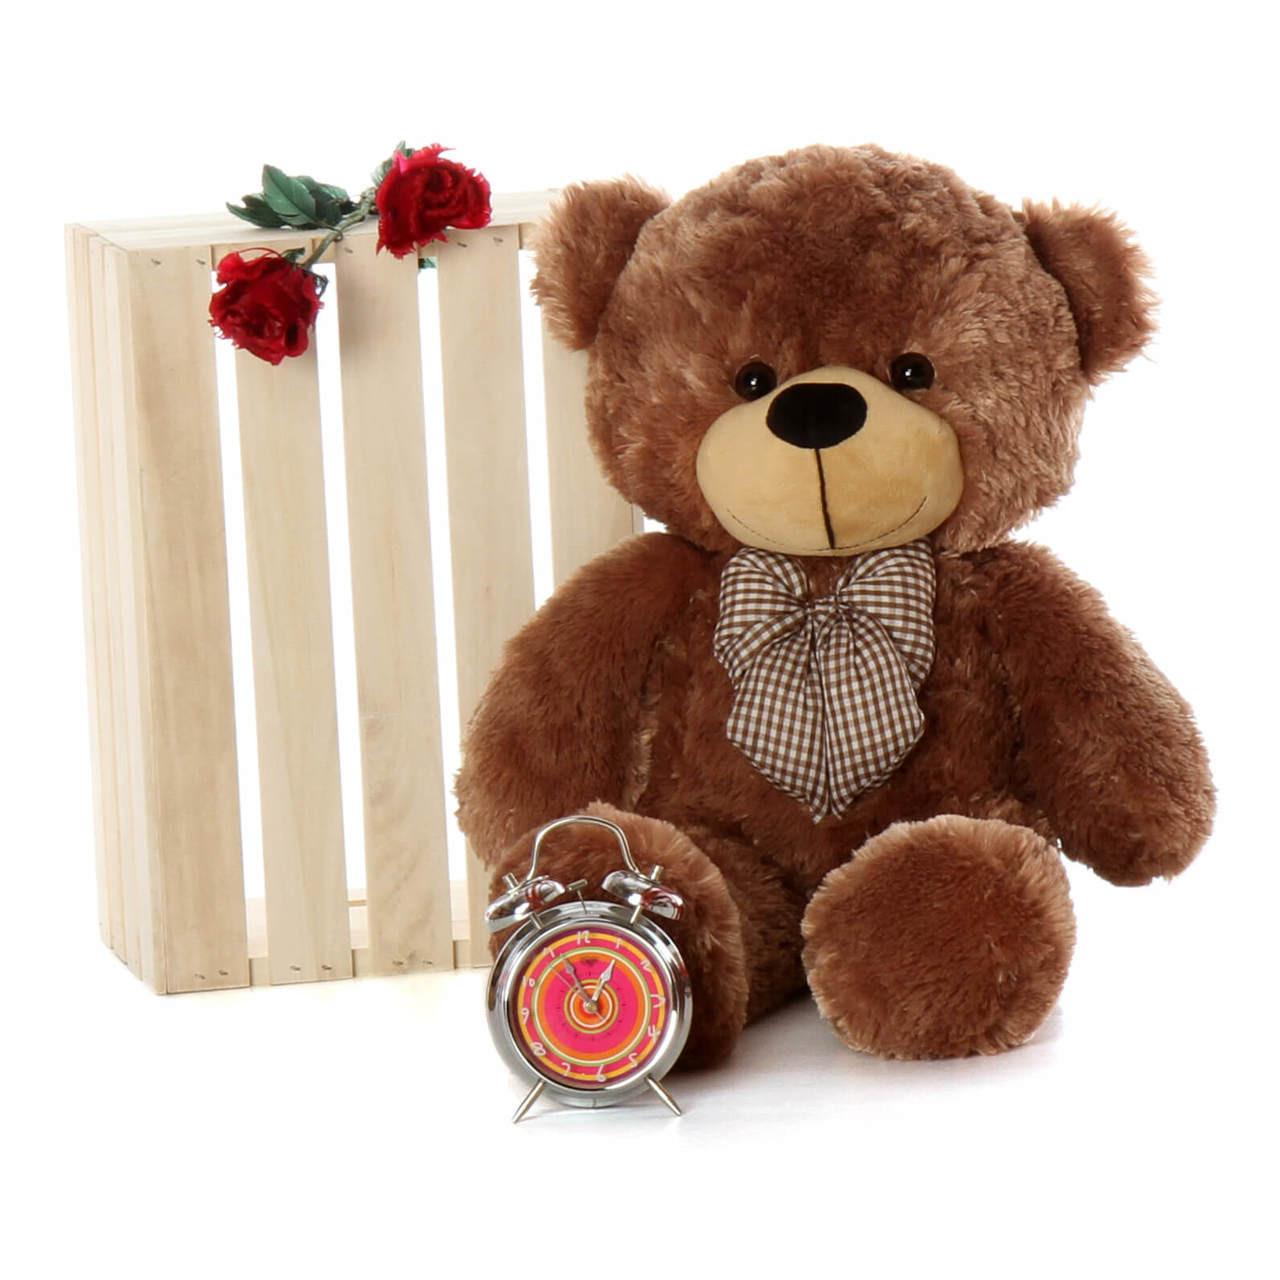 Oversized Mocha Brown Teddy Bear Sunny Cuddles 30in